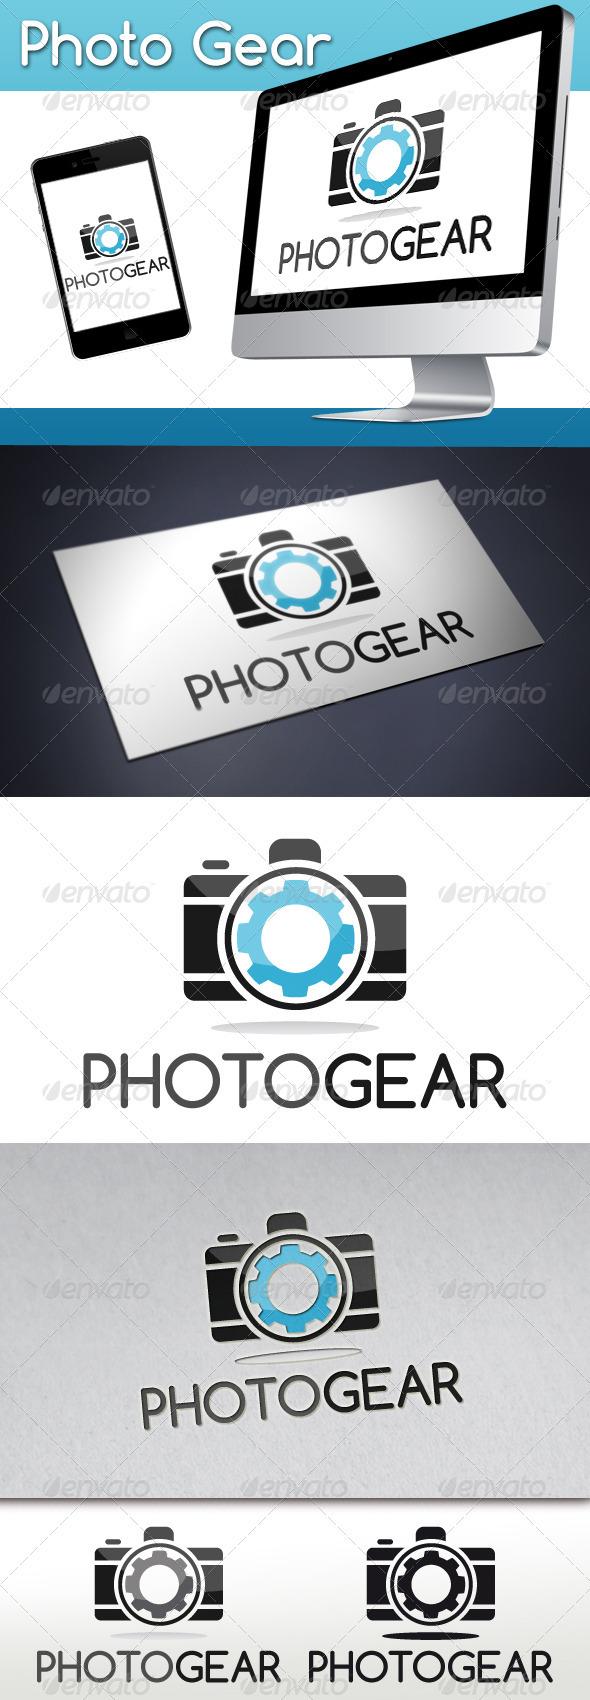 GraphicRiver Photo Gear Logo 3327294